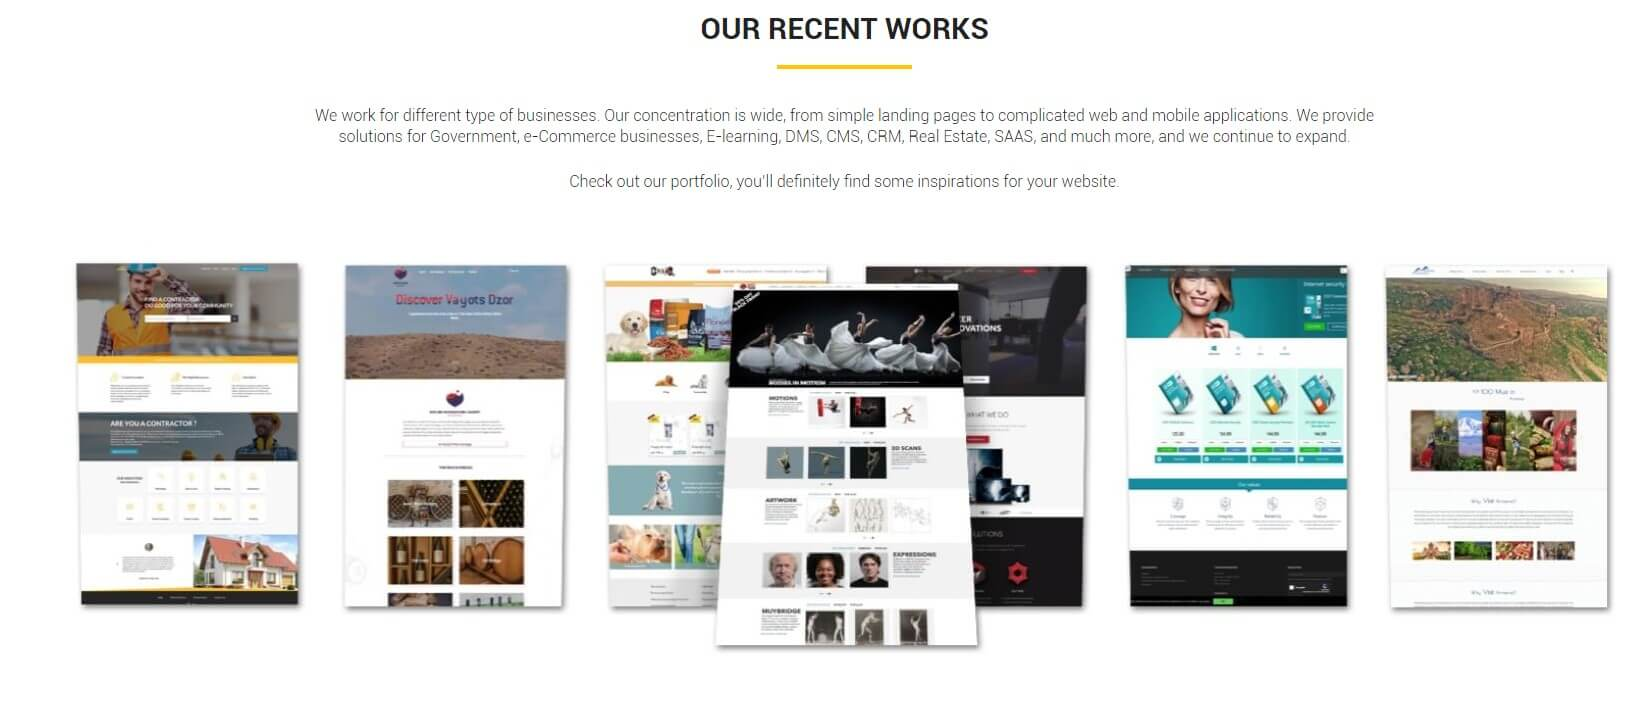 Check out the companies Portfolio